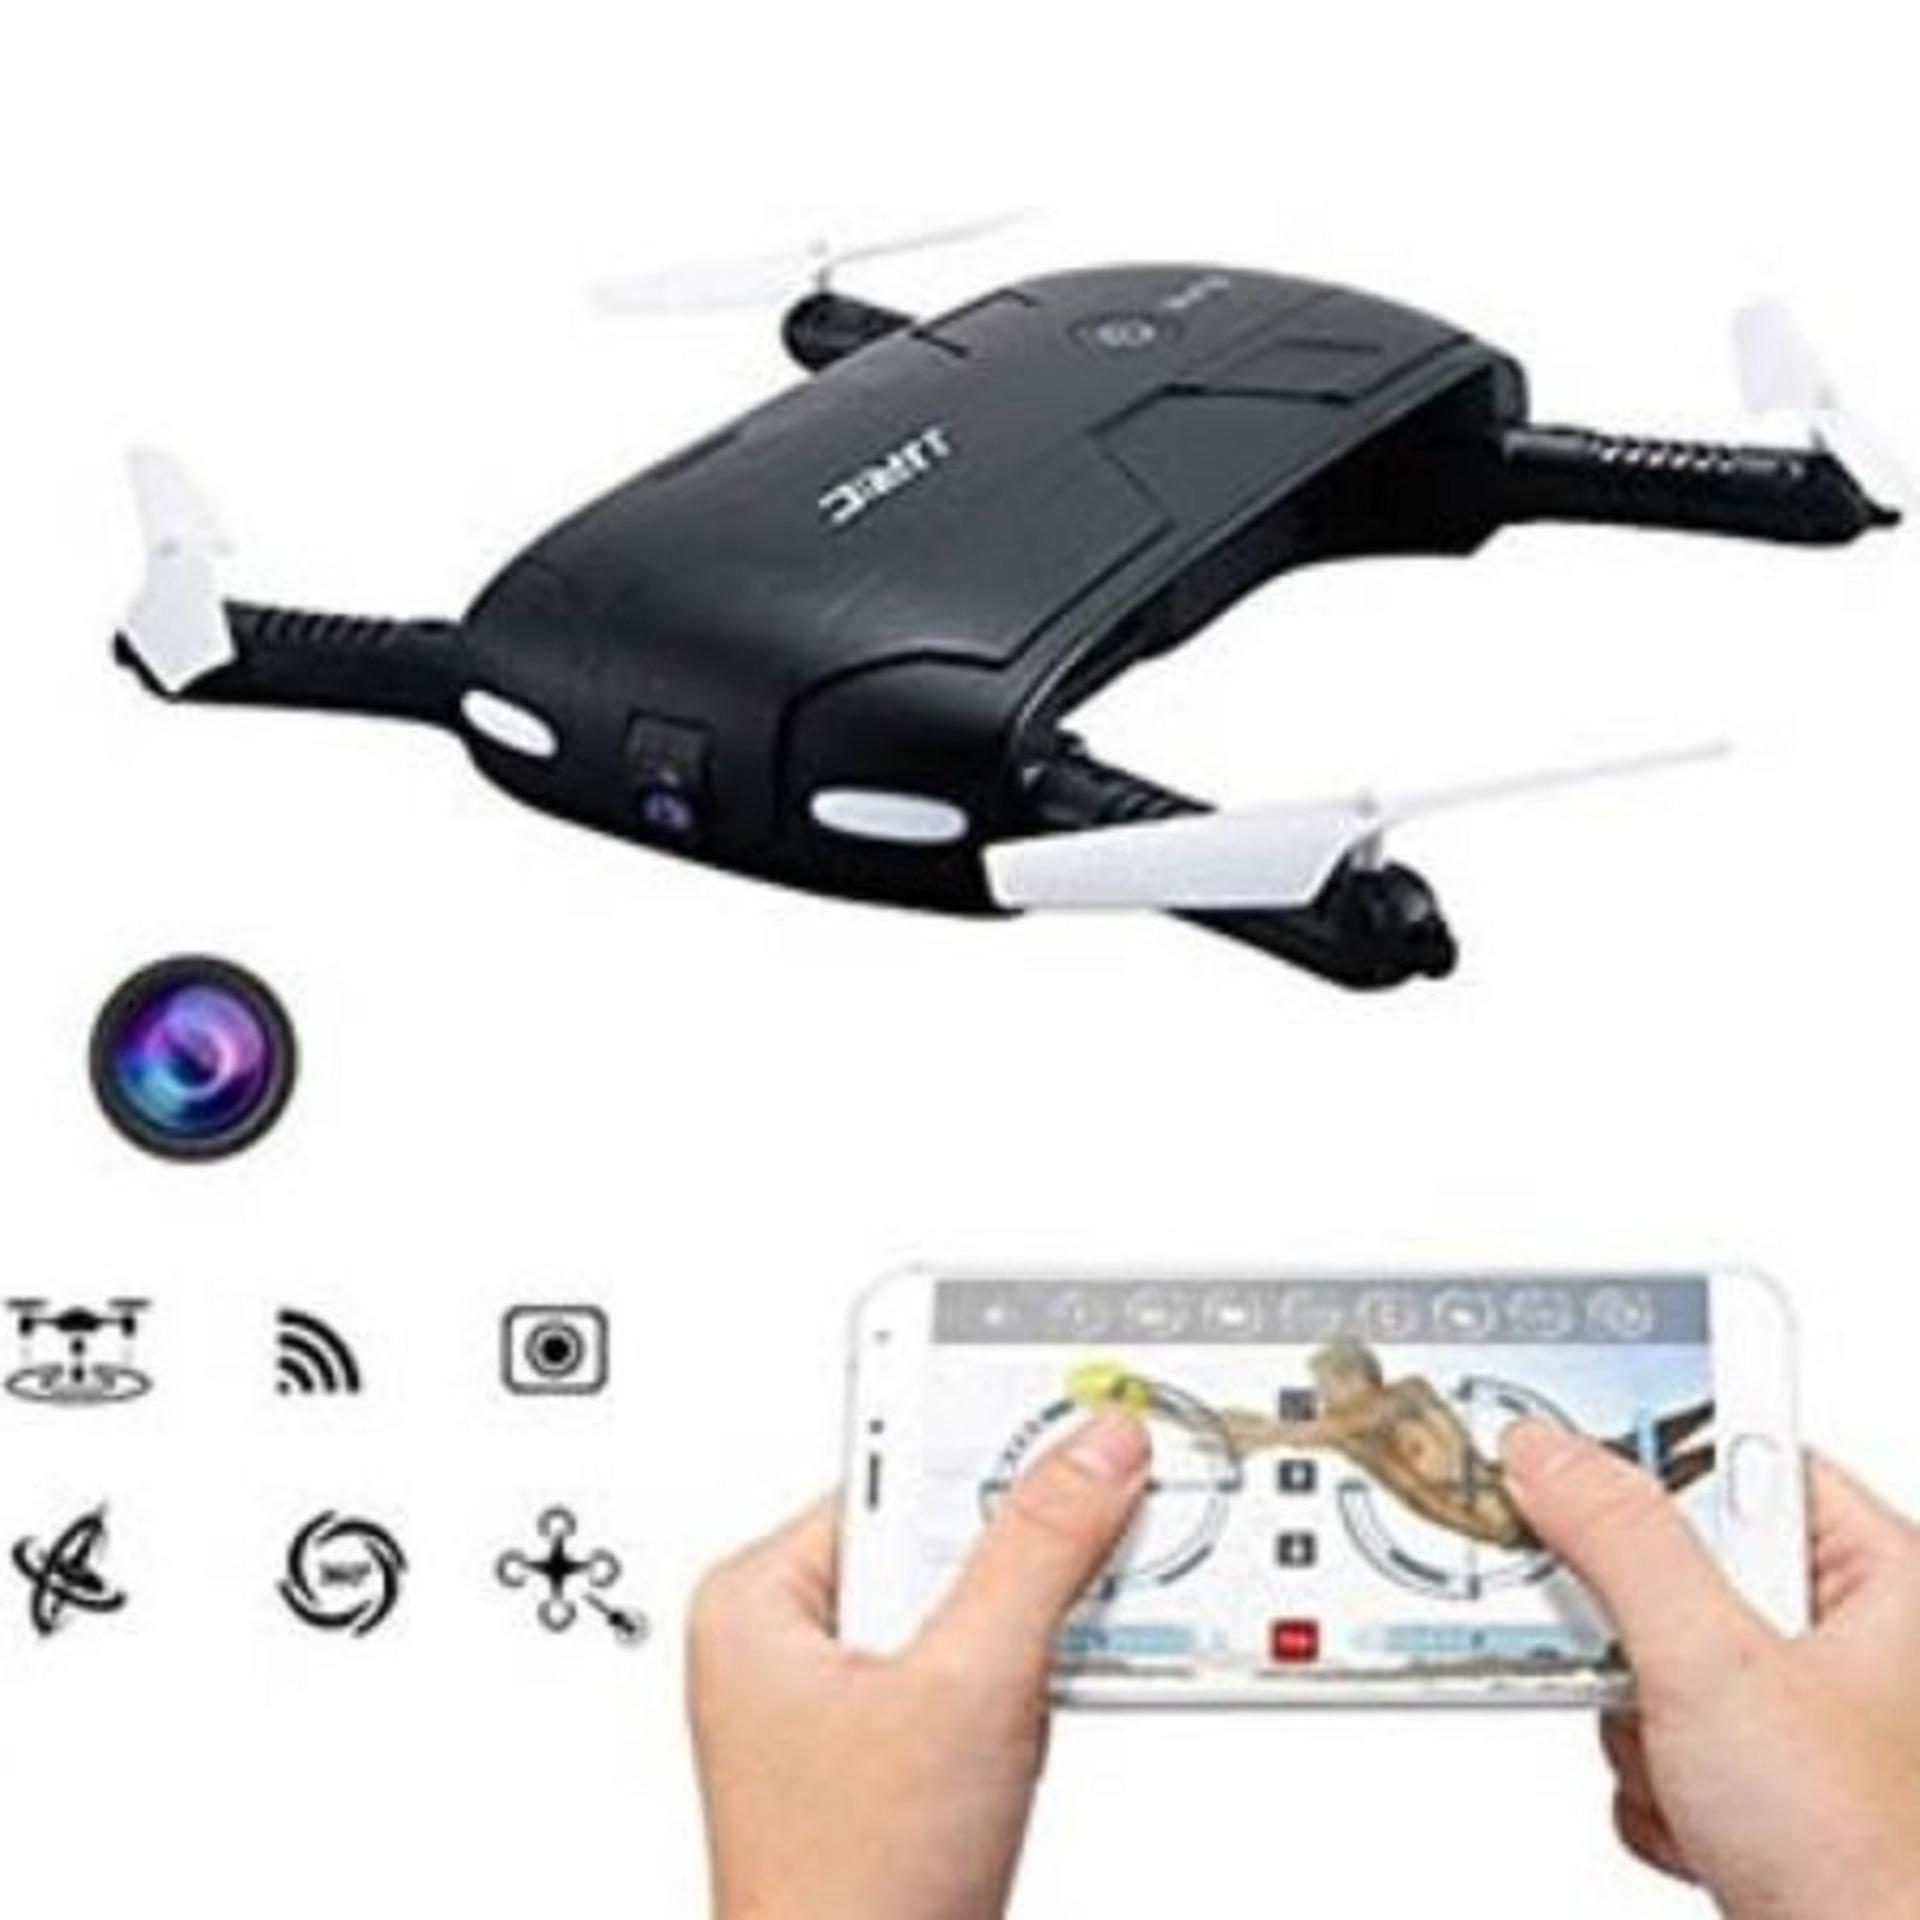 Quadcopter Huajun U Fly W606 3 58g Fpv 2 Mega Camera 24g 4 Channel 6 Syma X8w Rc Drone With Wifi Axis Support Action Cam Gopro Yi Hitam Jjrc H 37 Elfie Hd Pocket Termurah